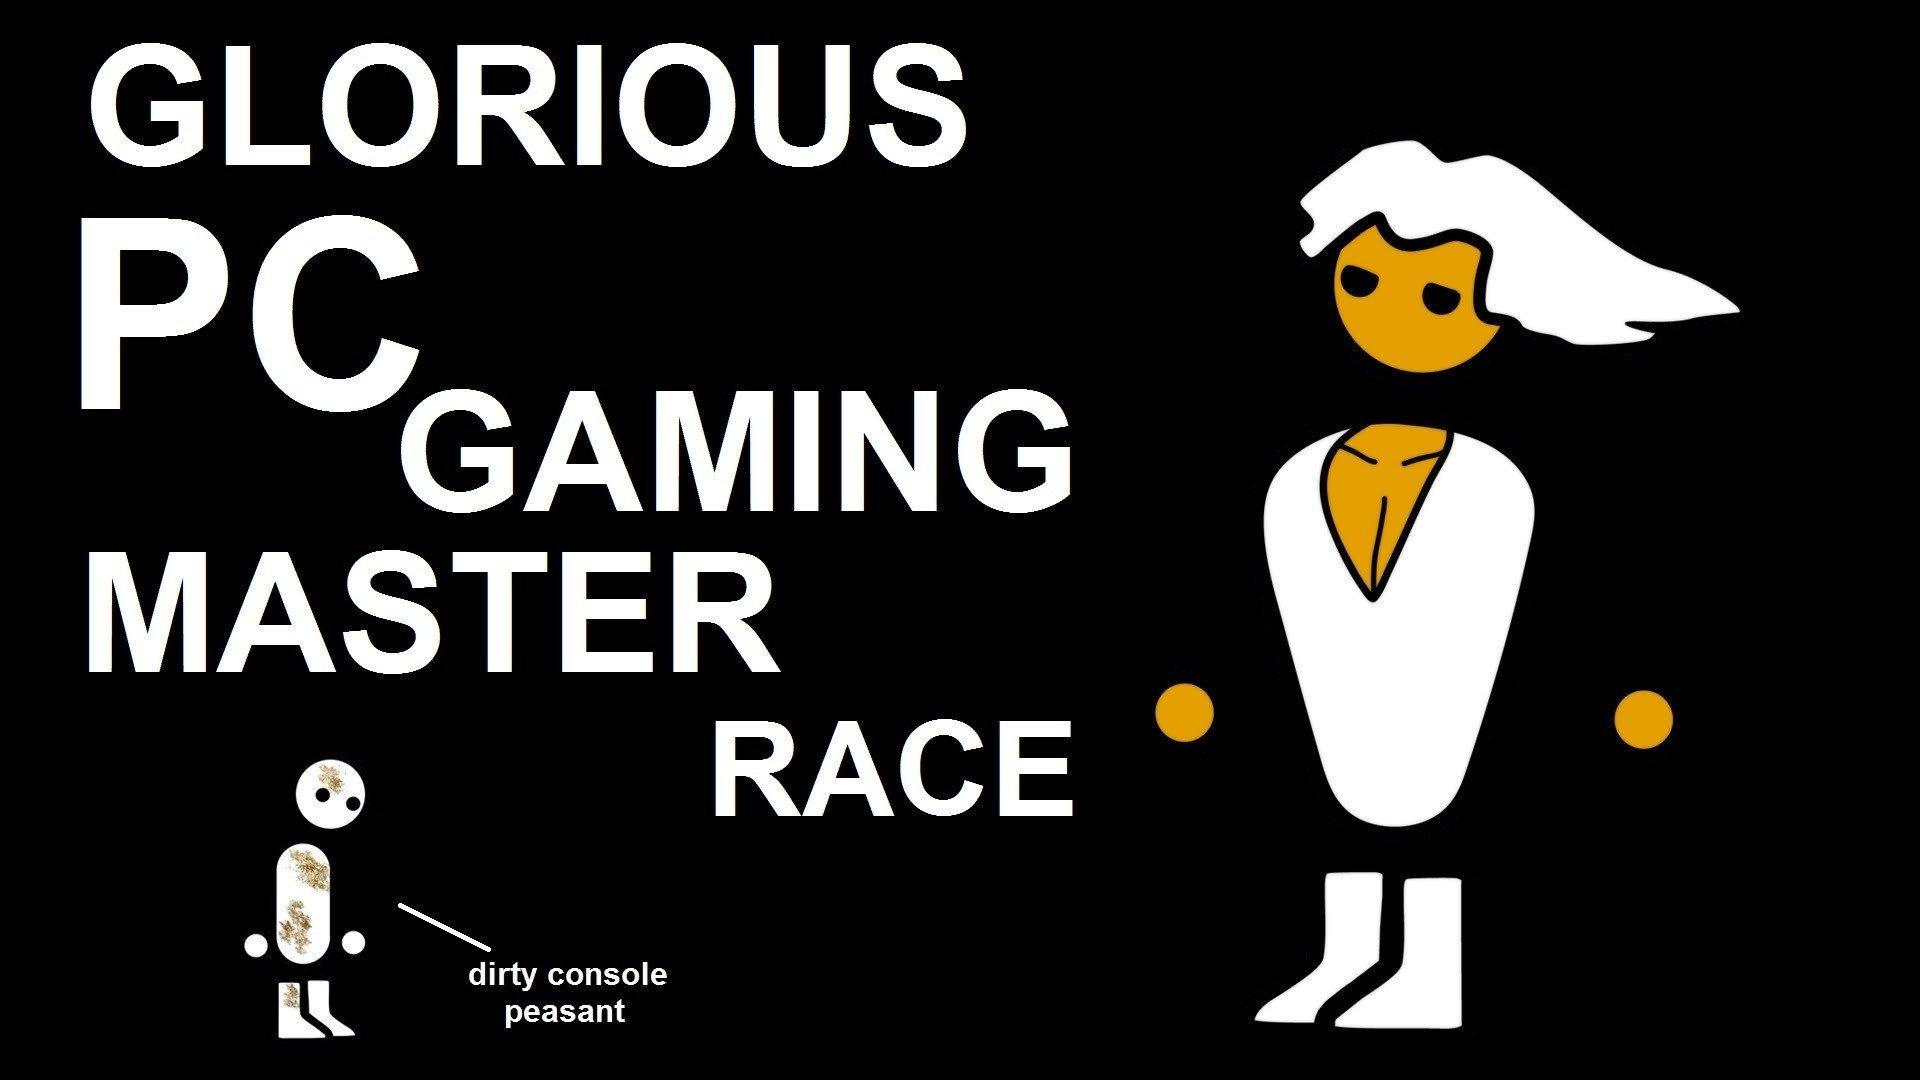 pc master race wallpaper - photo #20